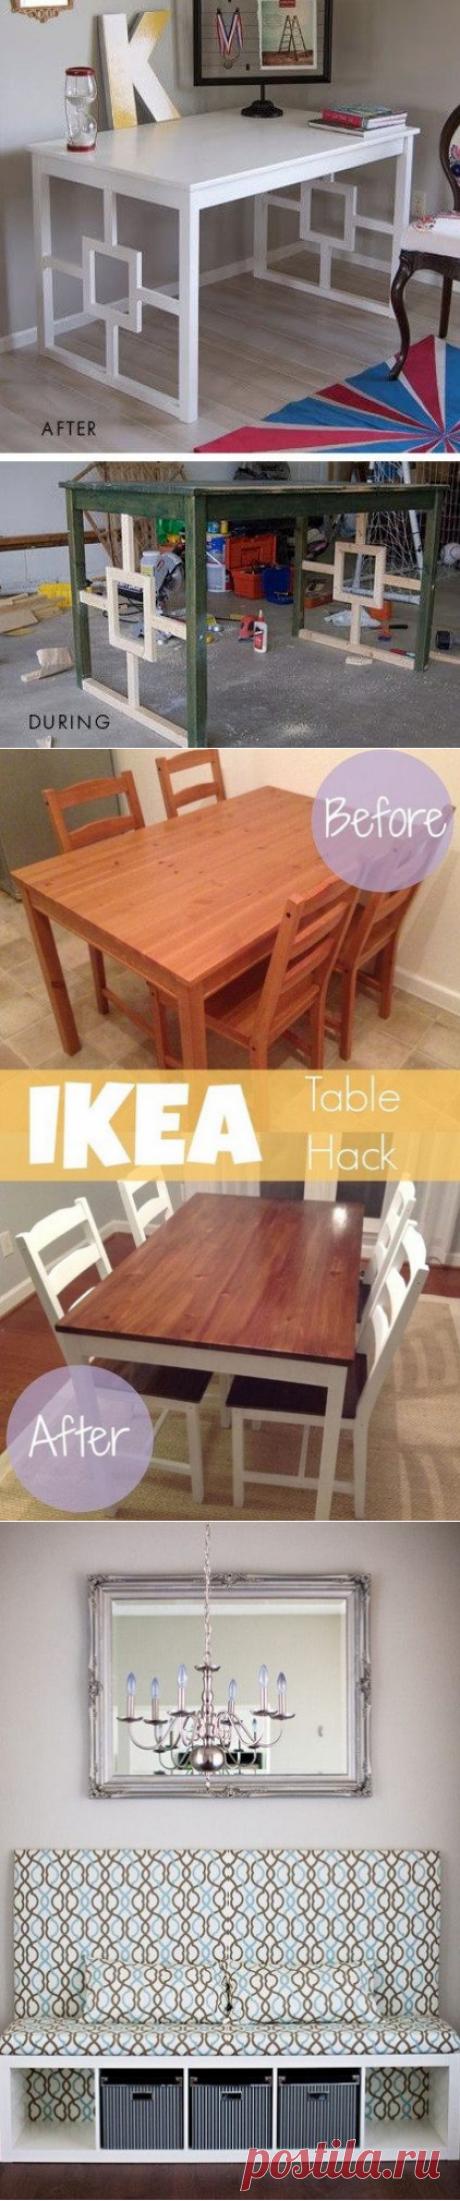 Идеи переделки мебели